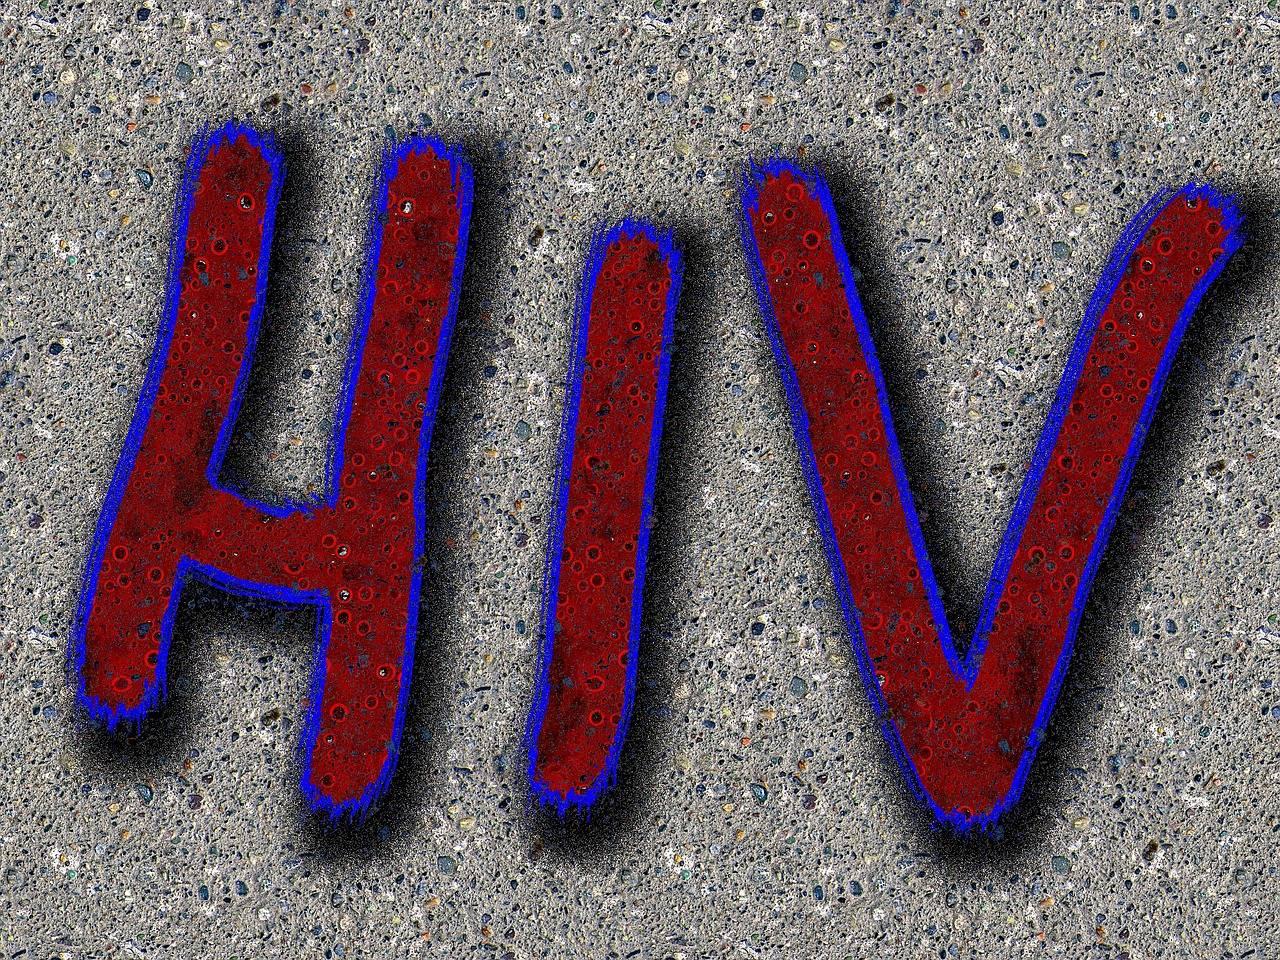 ВИЧ и гепатит В